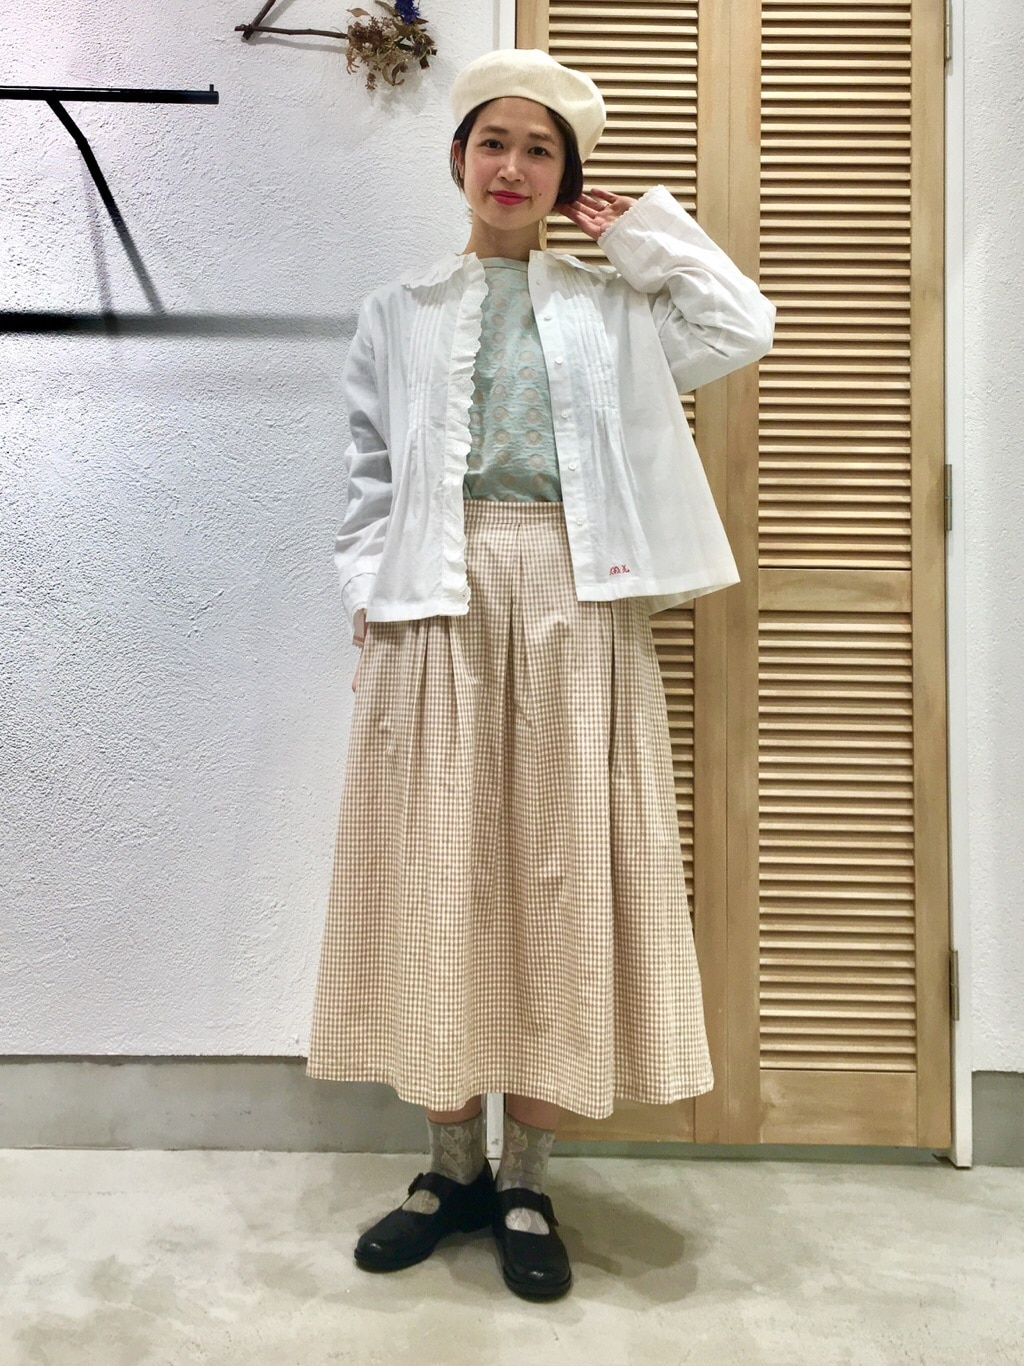 chambre de charme 横浜ジョイナス 身長:160cm 2021.02.28